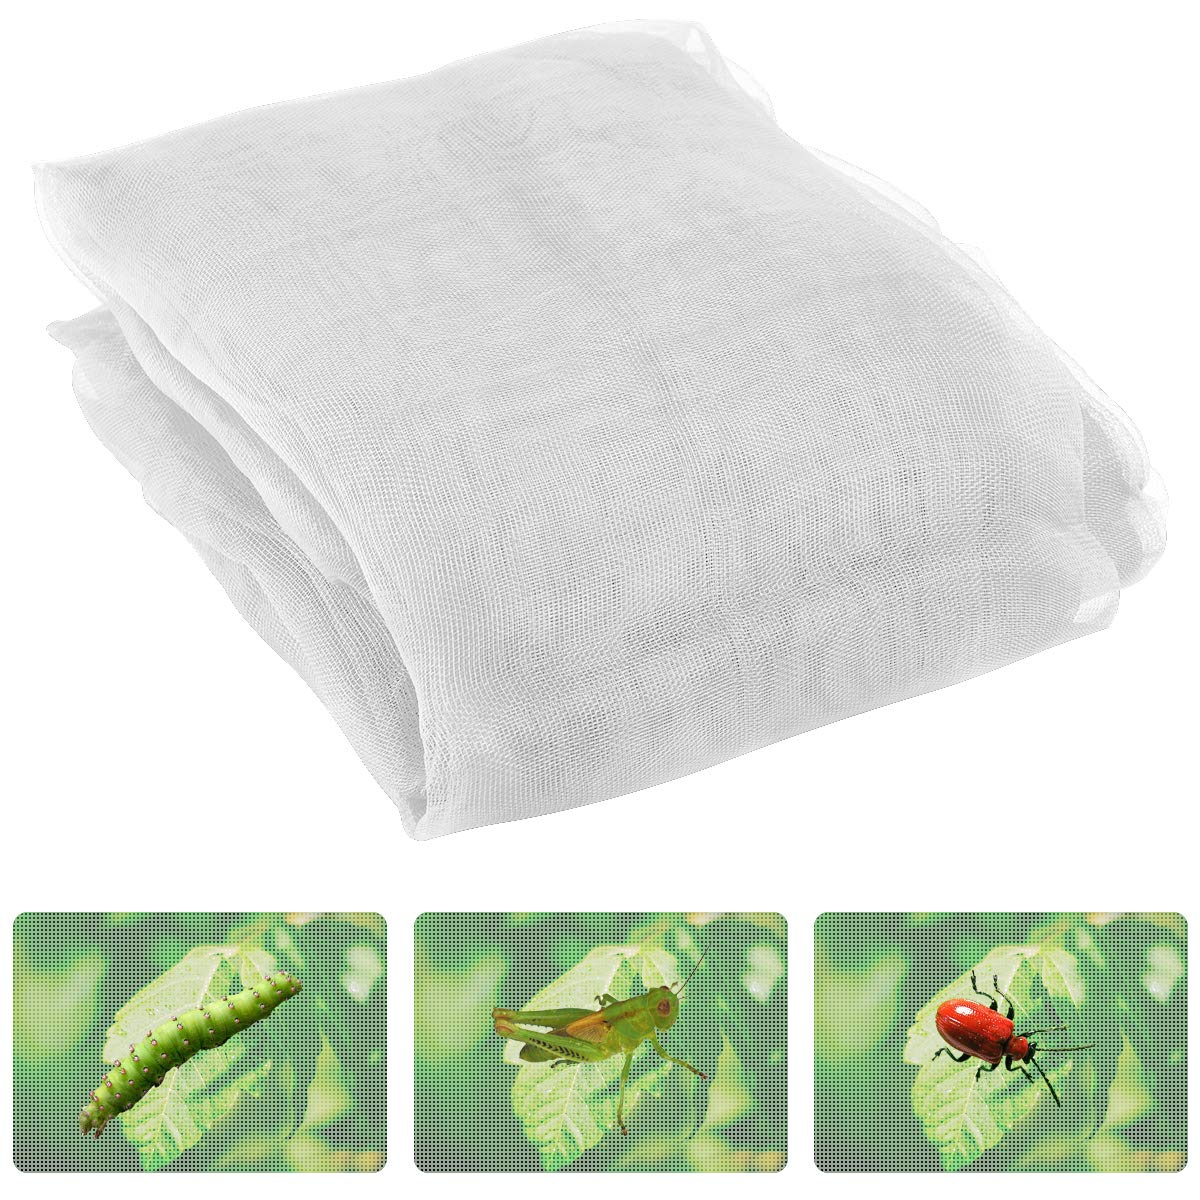 Anphisn ANPHSIN 2 Pack Garden Insect Screen Insect Barrier Netting Mesh Bird Netting 9.8ft × 11.4ft (White)